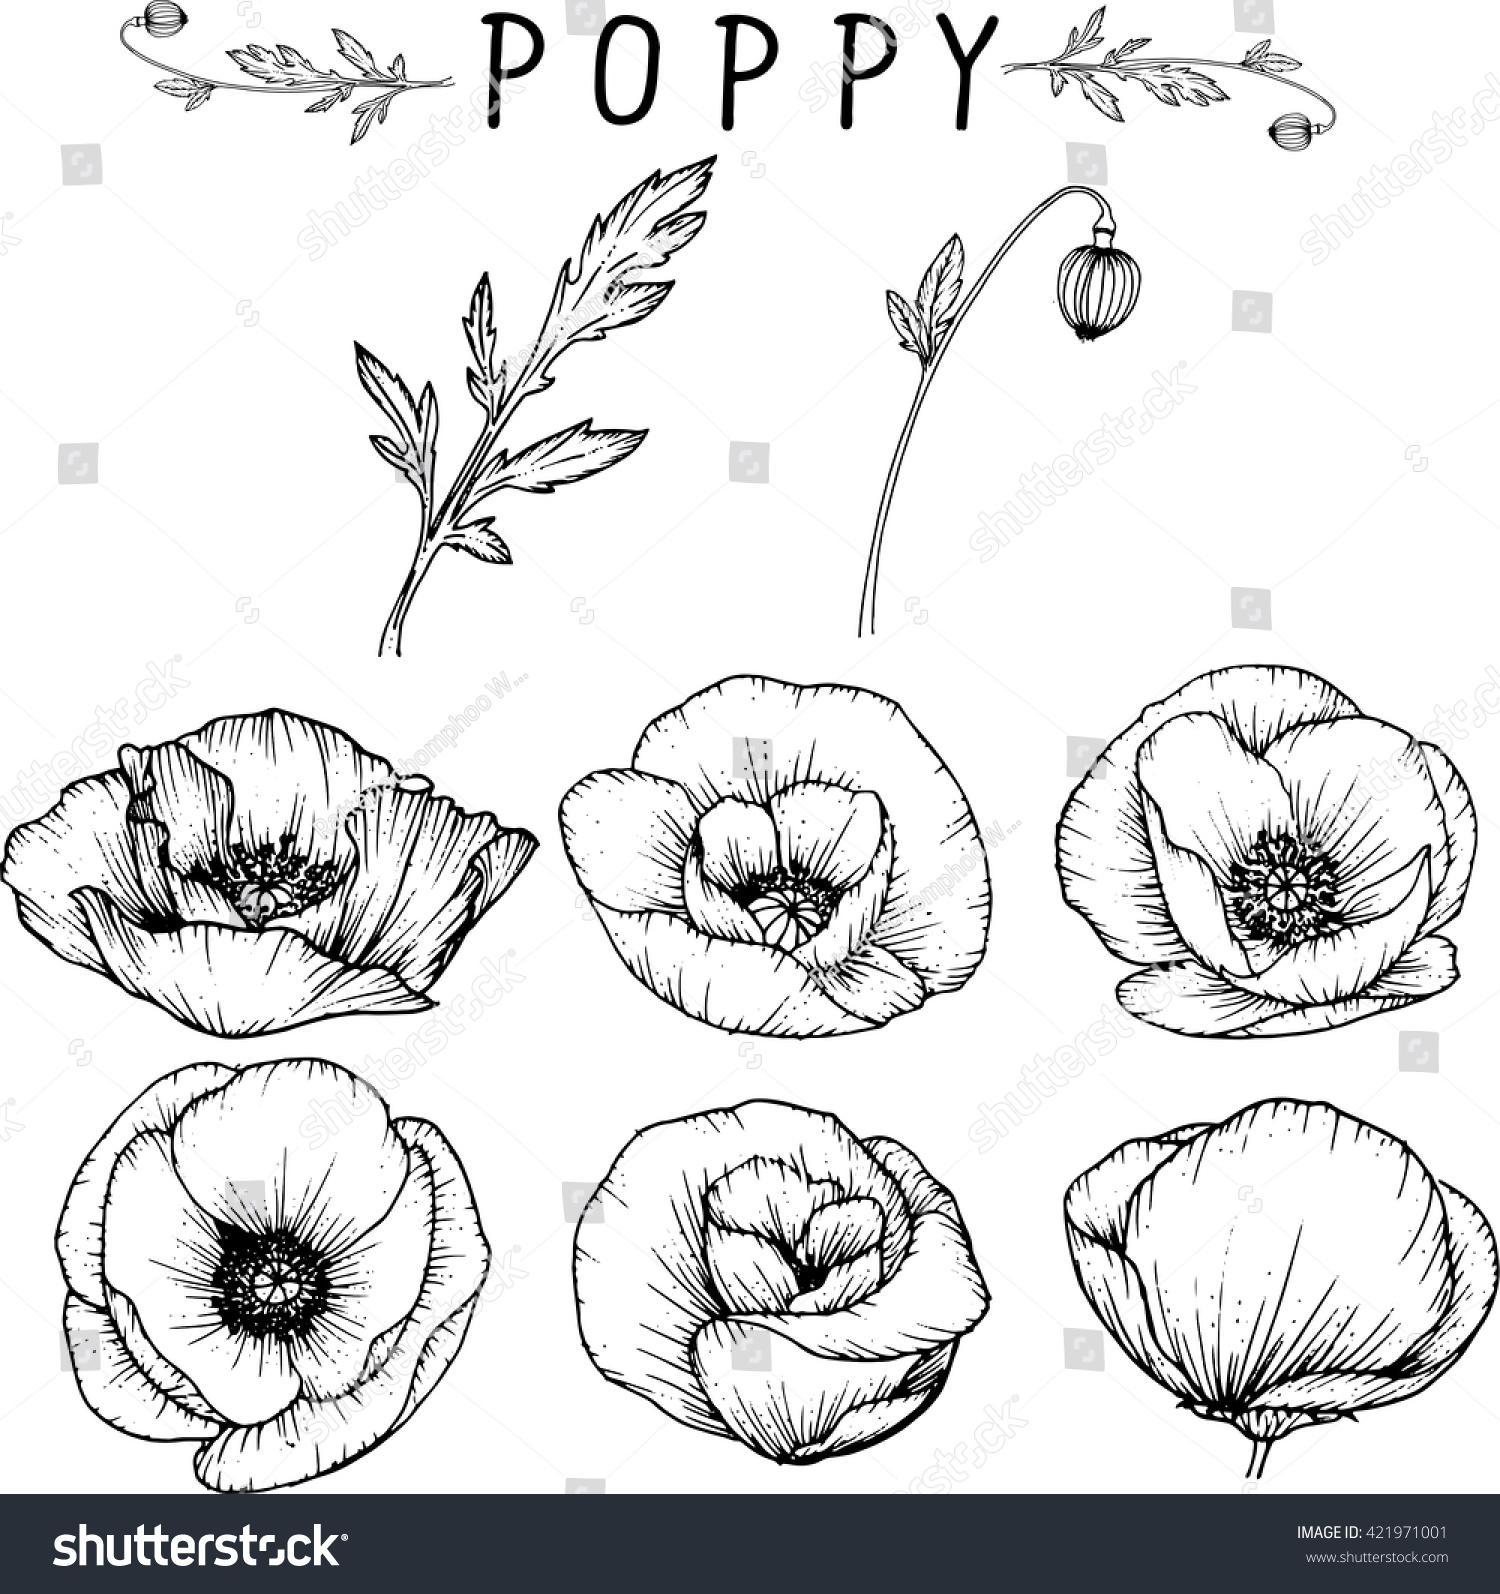 Poppy Flowers Drawings Vector Stock Vector Royalty Free 421971001